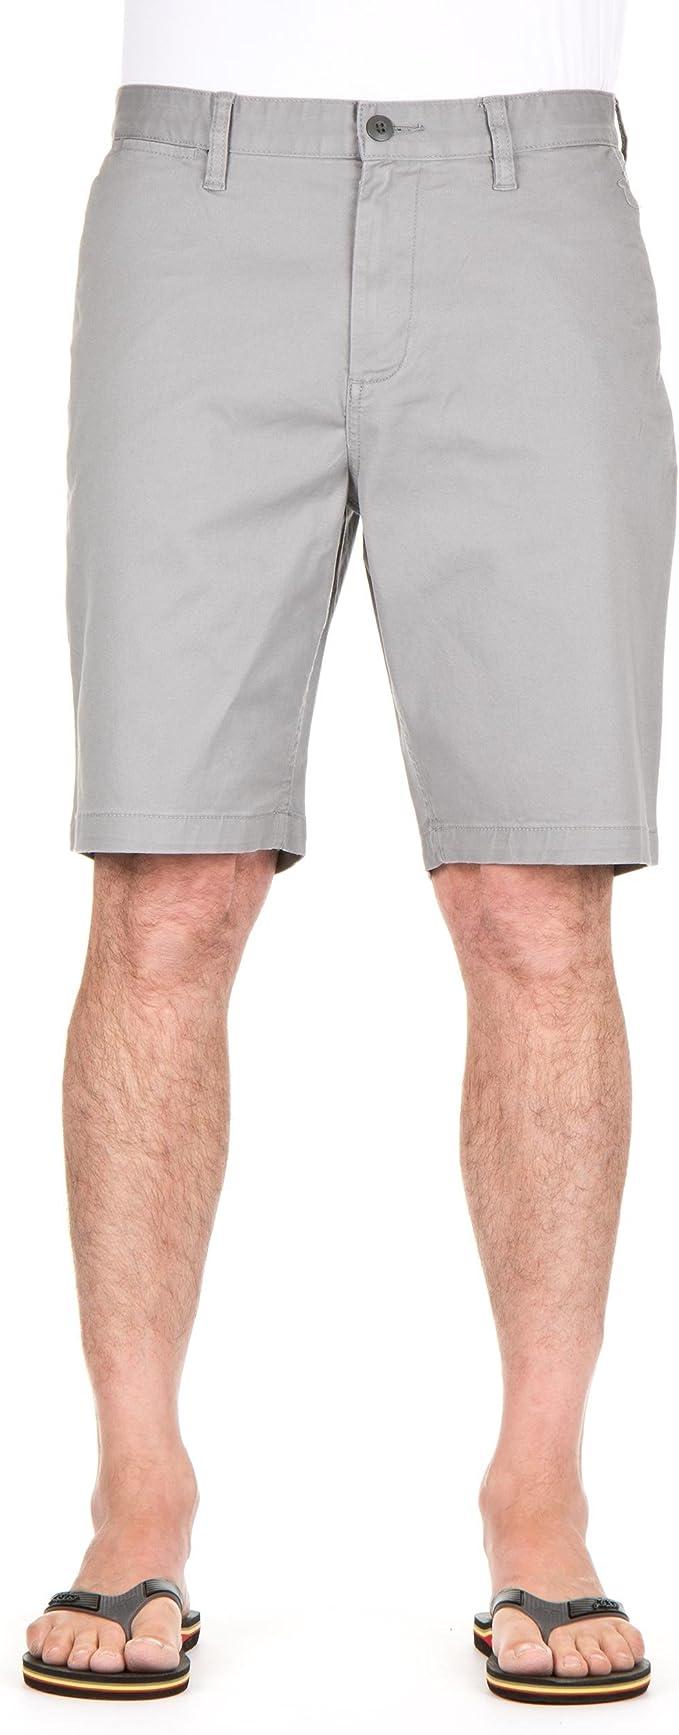 DC Mens Worker Straight Chino 20.5 Inch Walk Shorts